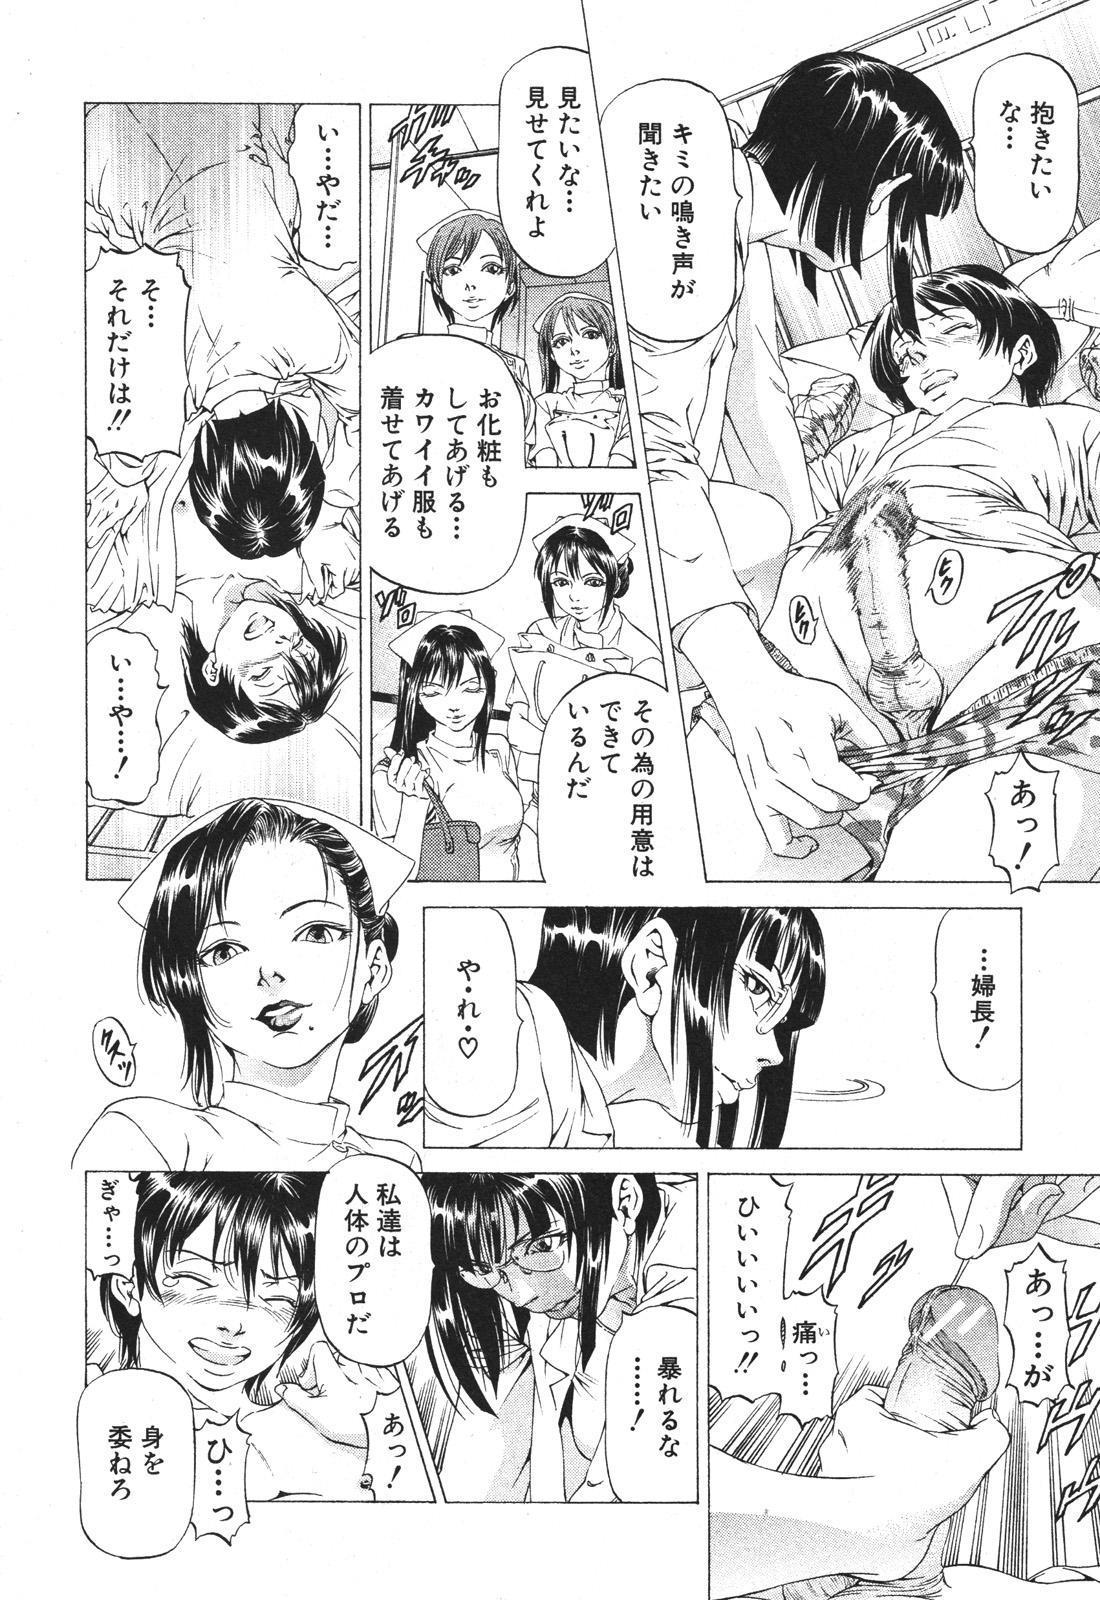 BUSTER COMIC 2010-05 Vol.07 164